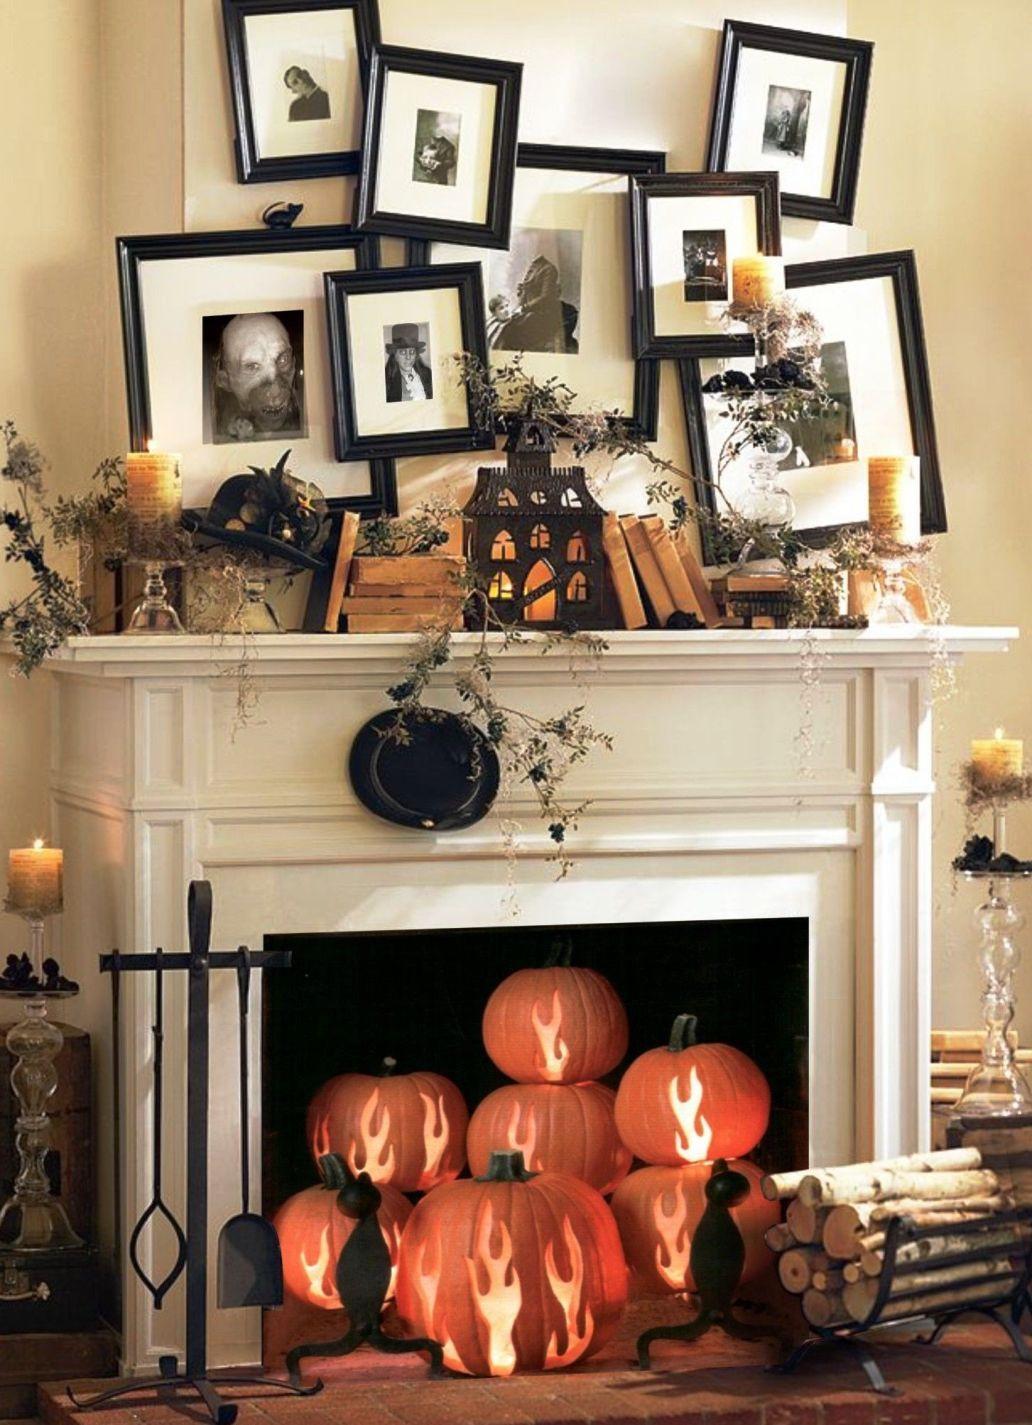 Halloween Living Room Decor  21 Stylish Living Room Halloween Decorations Ideas